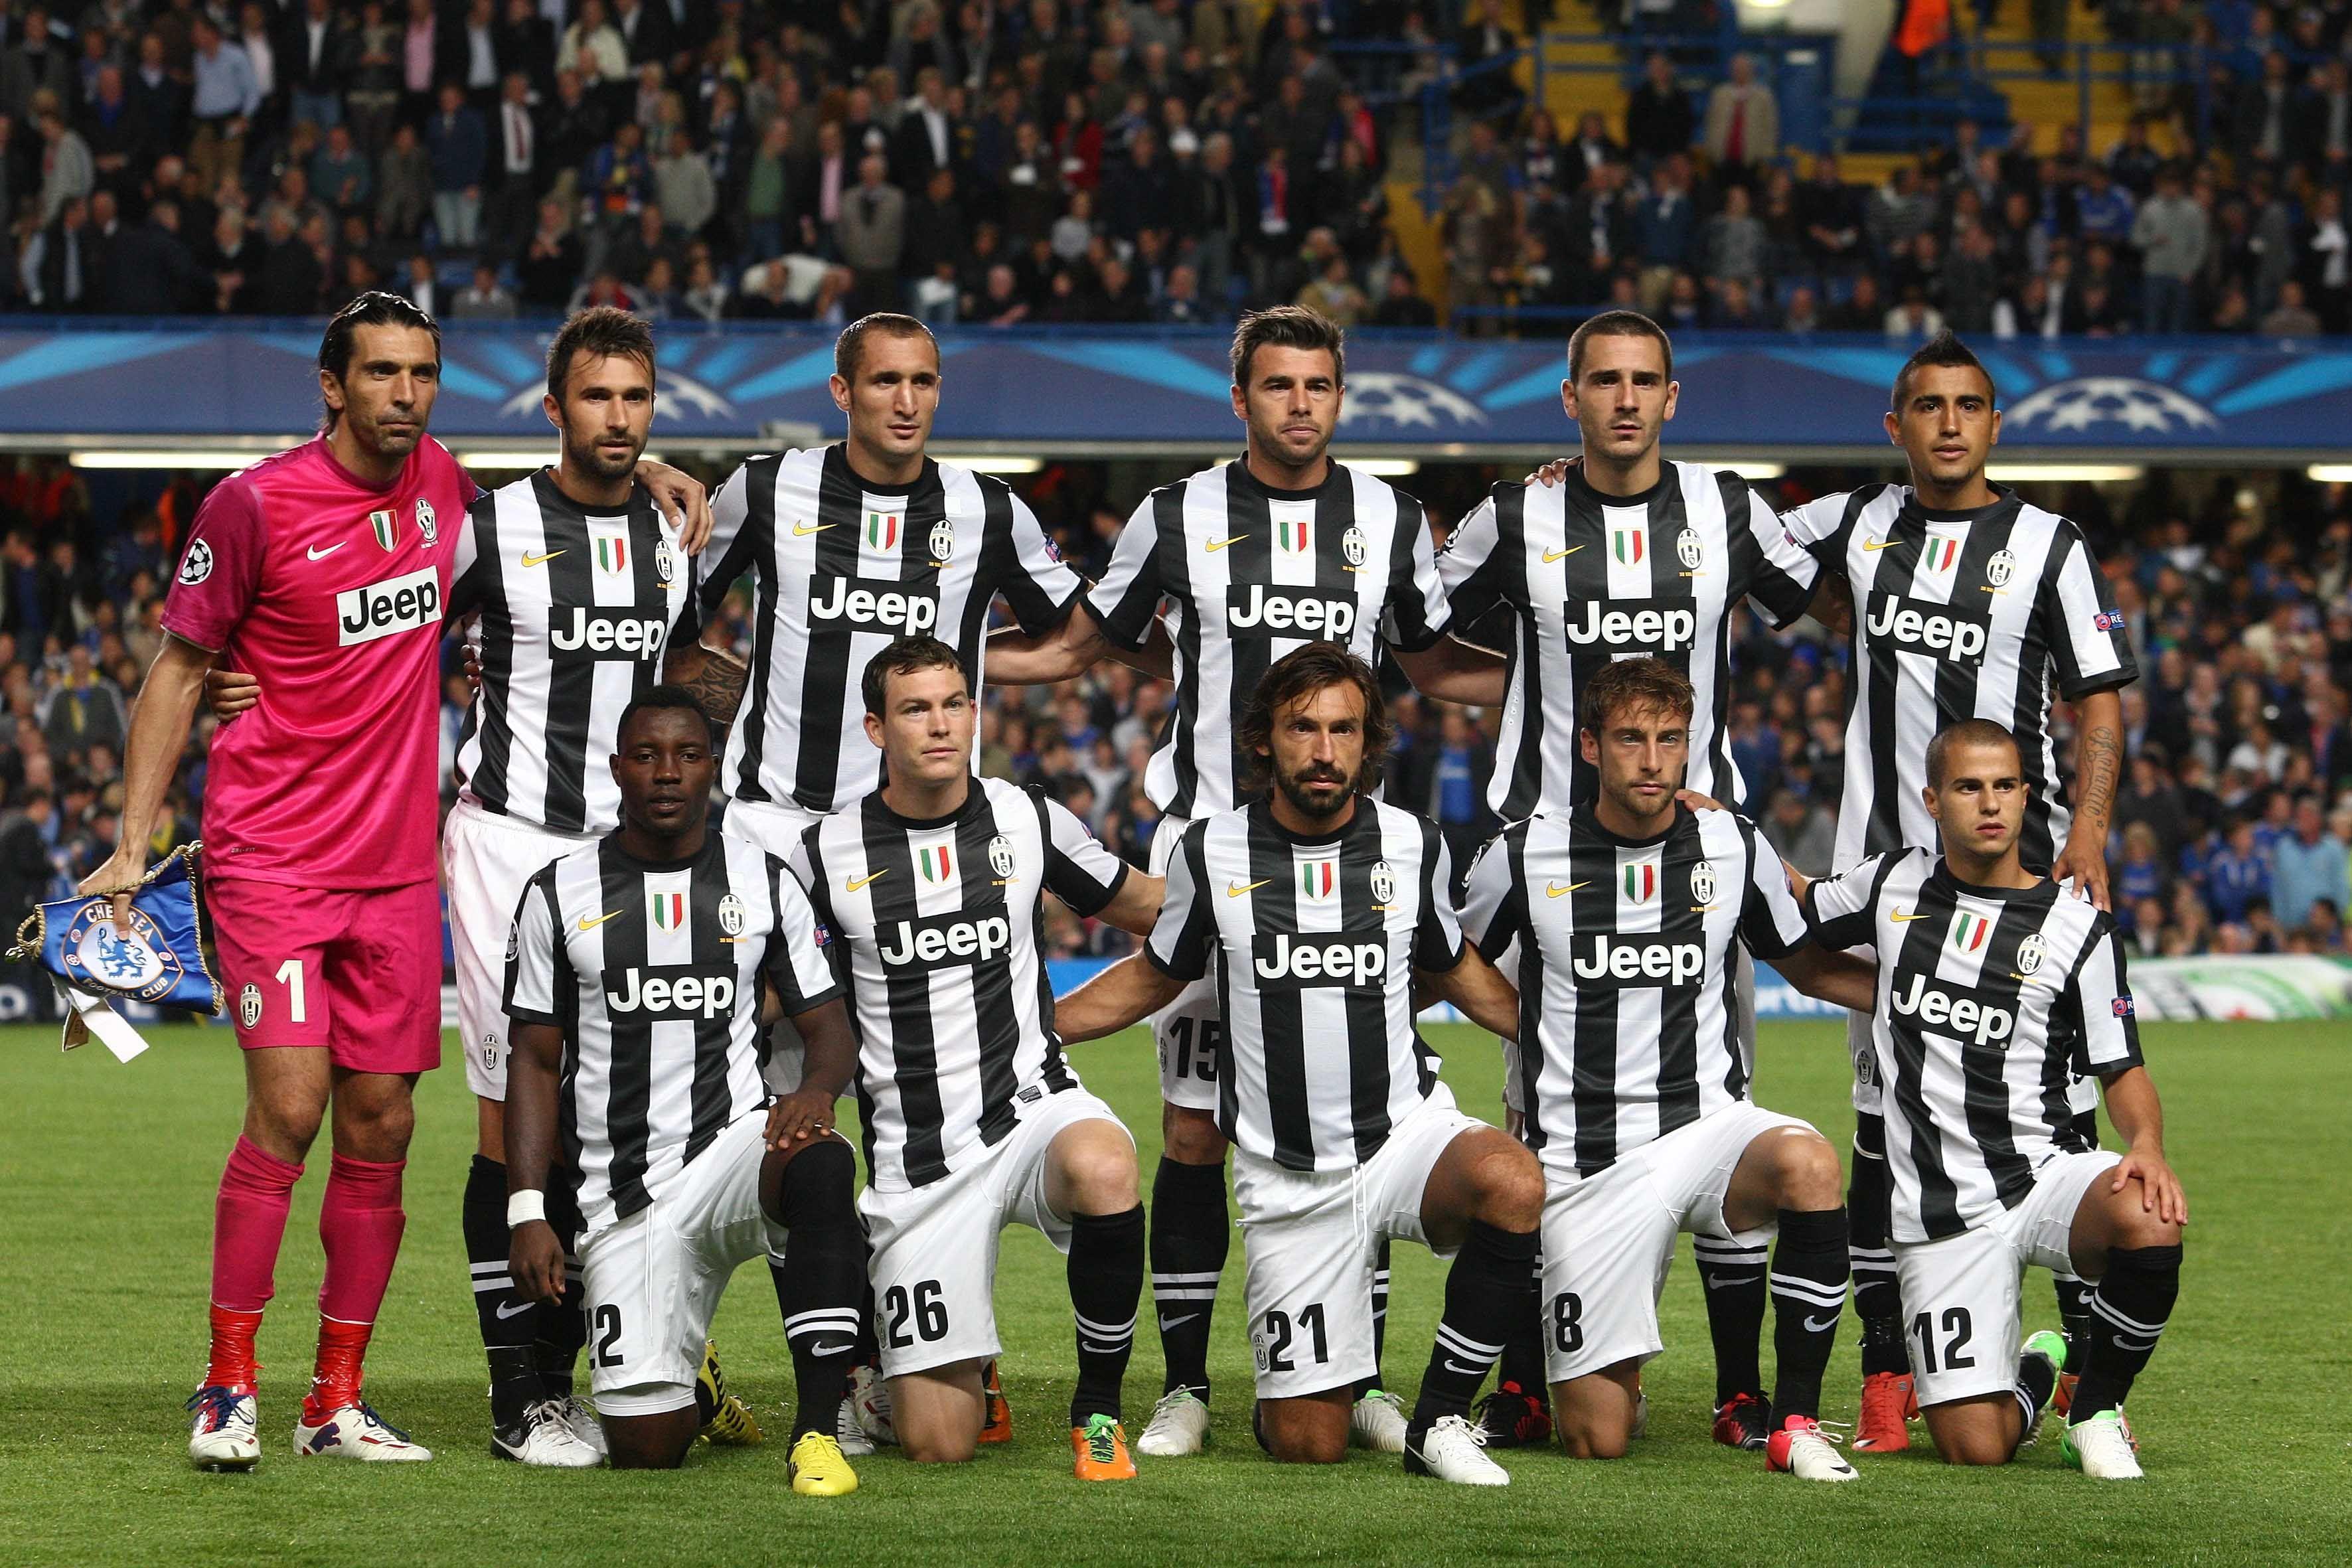 Chelsea FC vs. Juventus - UEFA Champions League 2012-2013